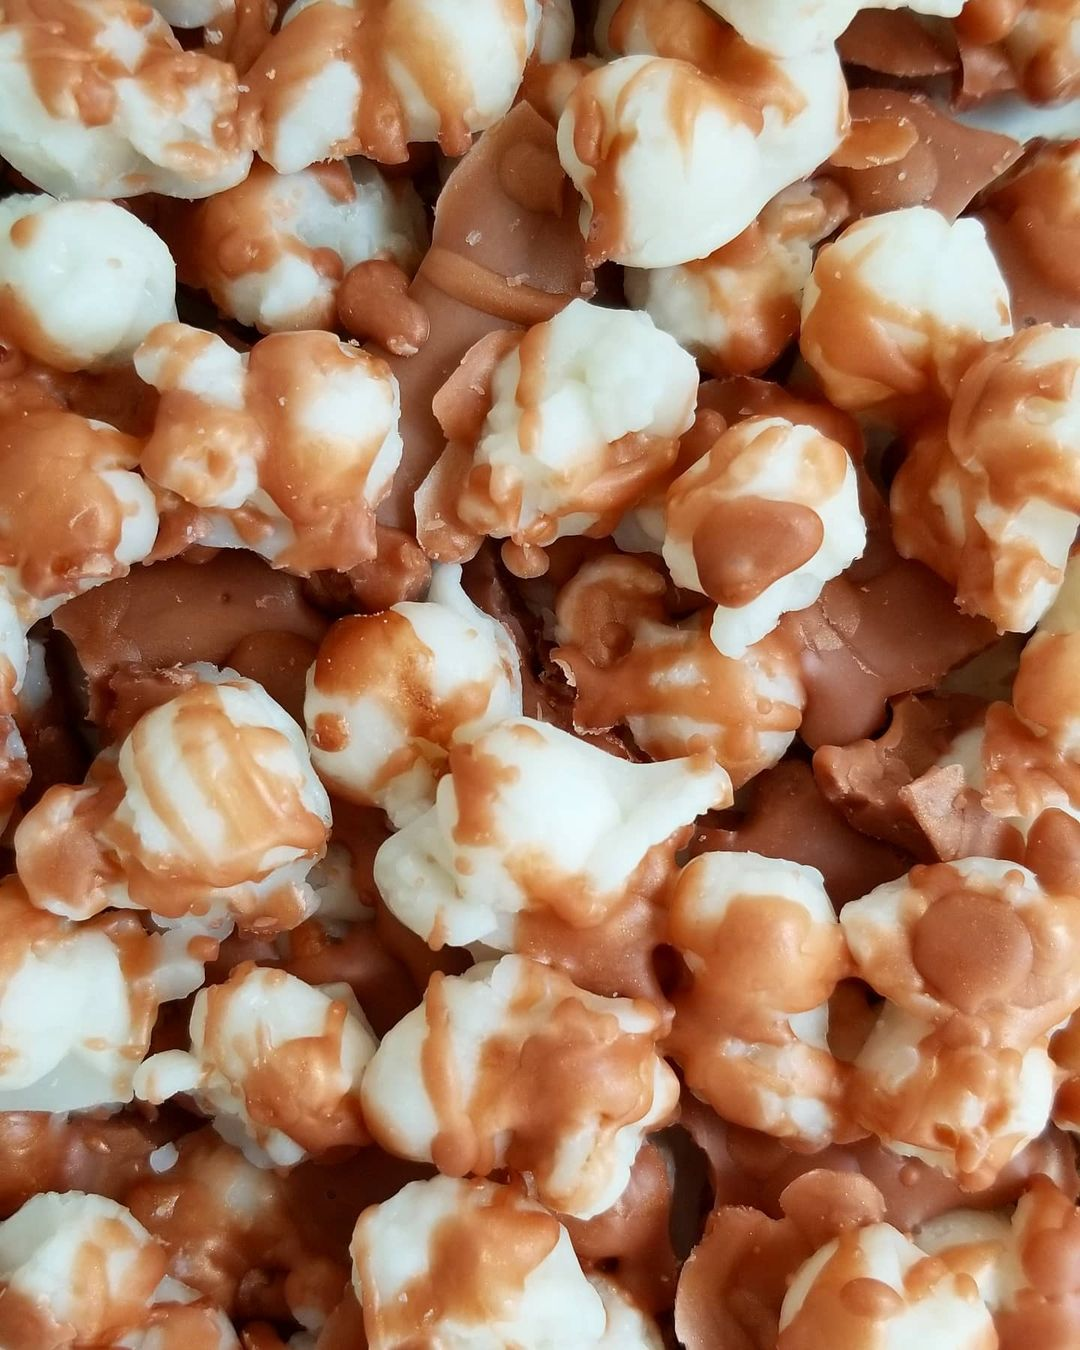 caramel popcorn wax melts by butter me soft